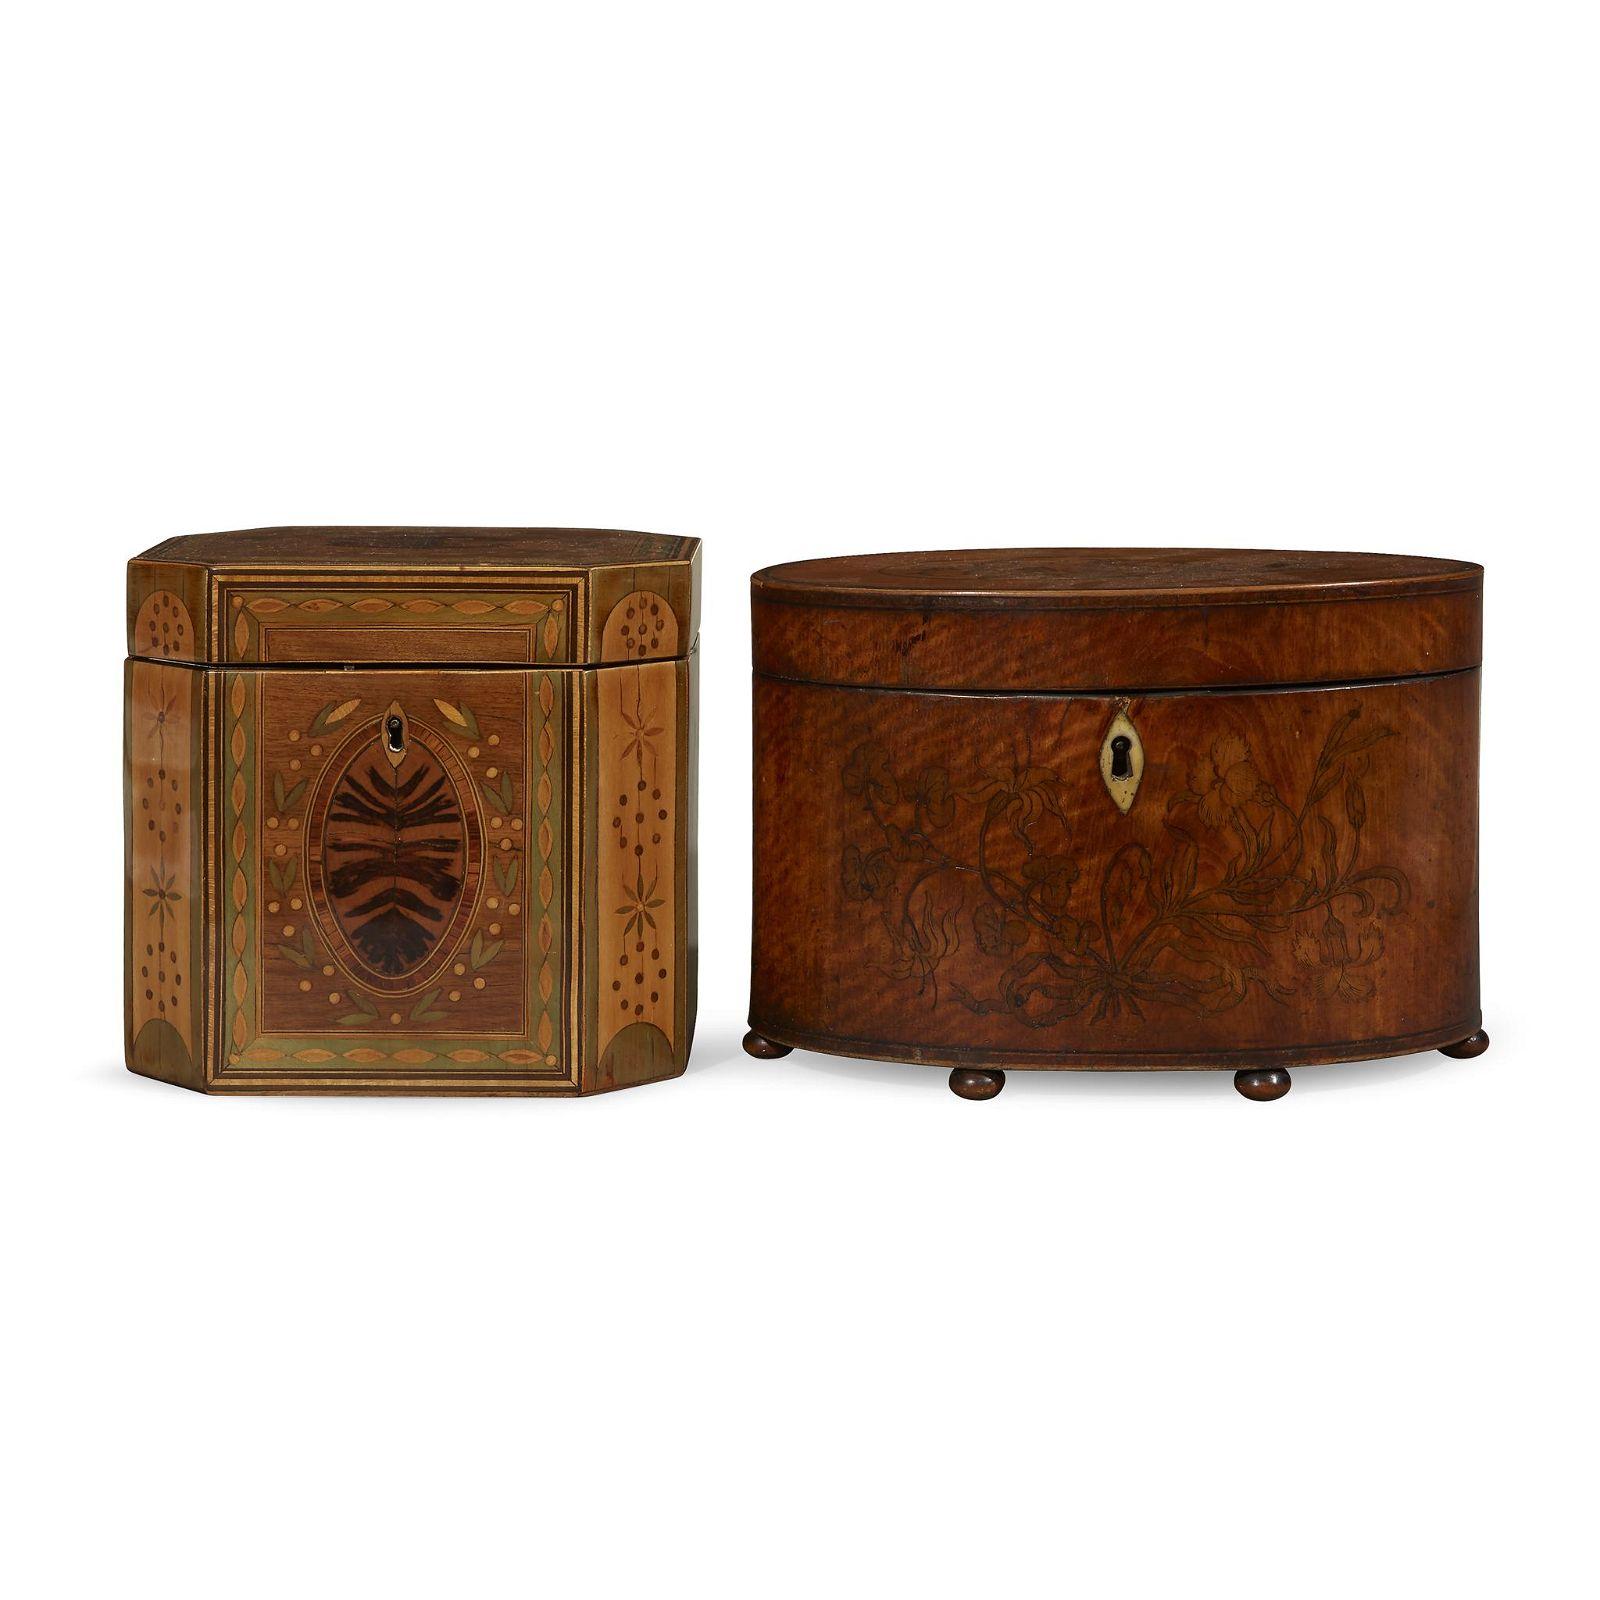 Two George III tea caddies, late 18th century